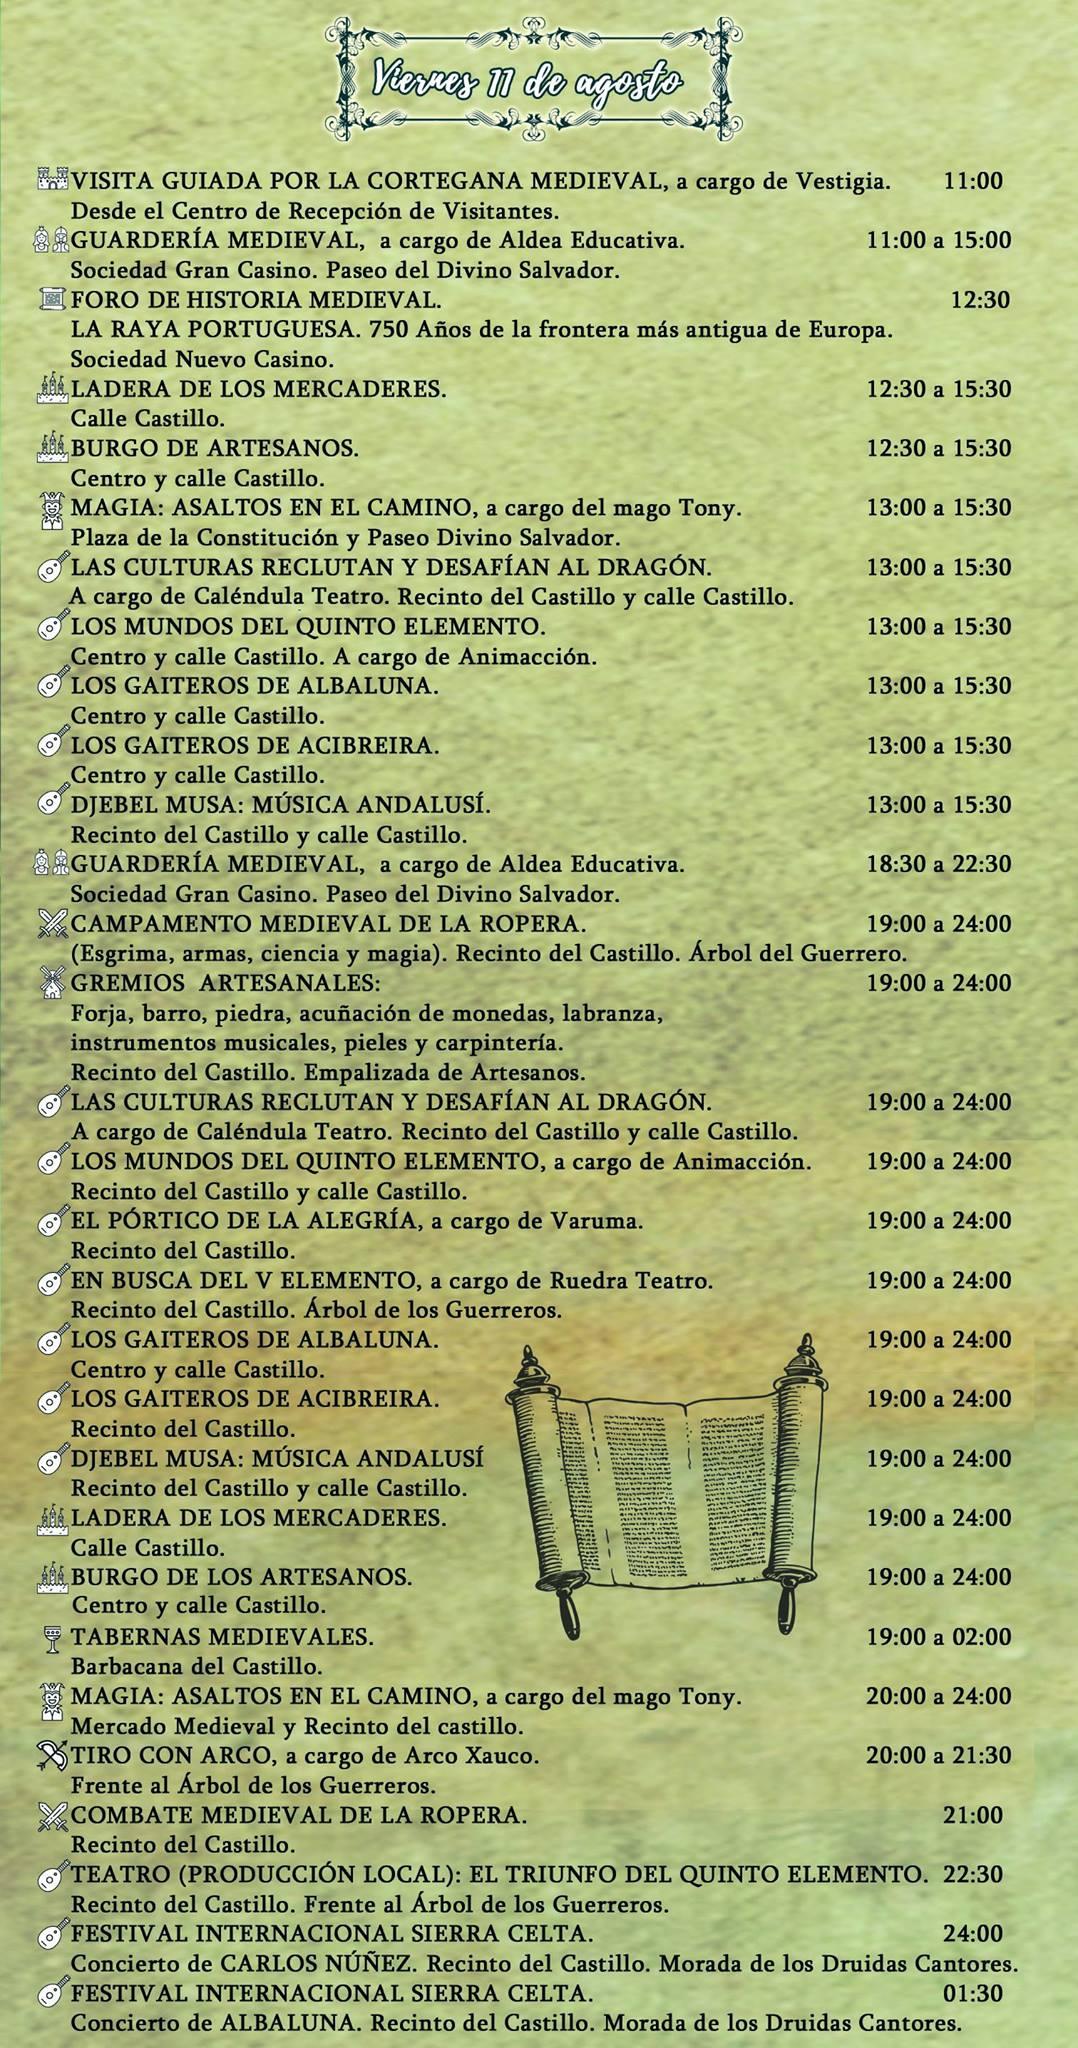 cortegana medievales